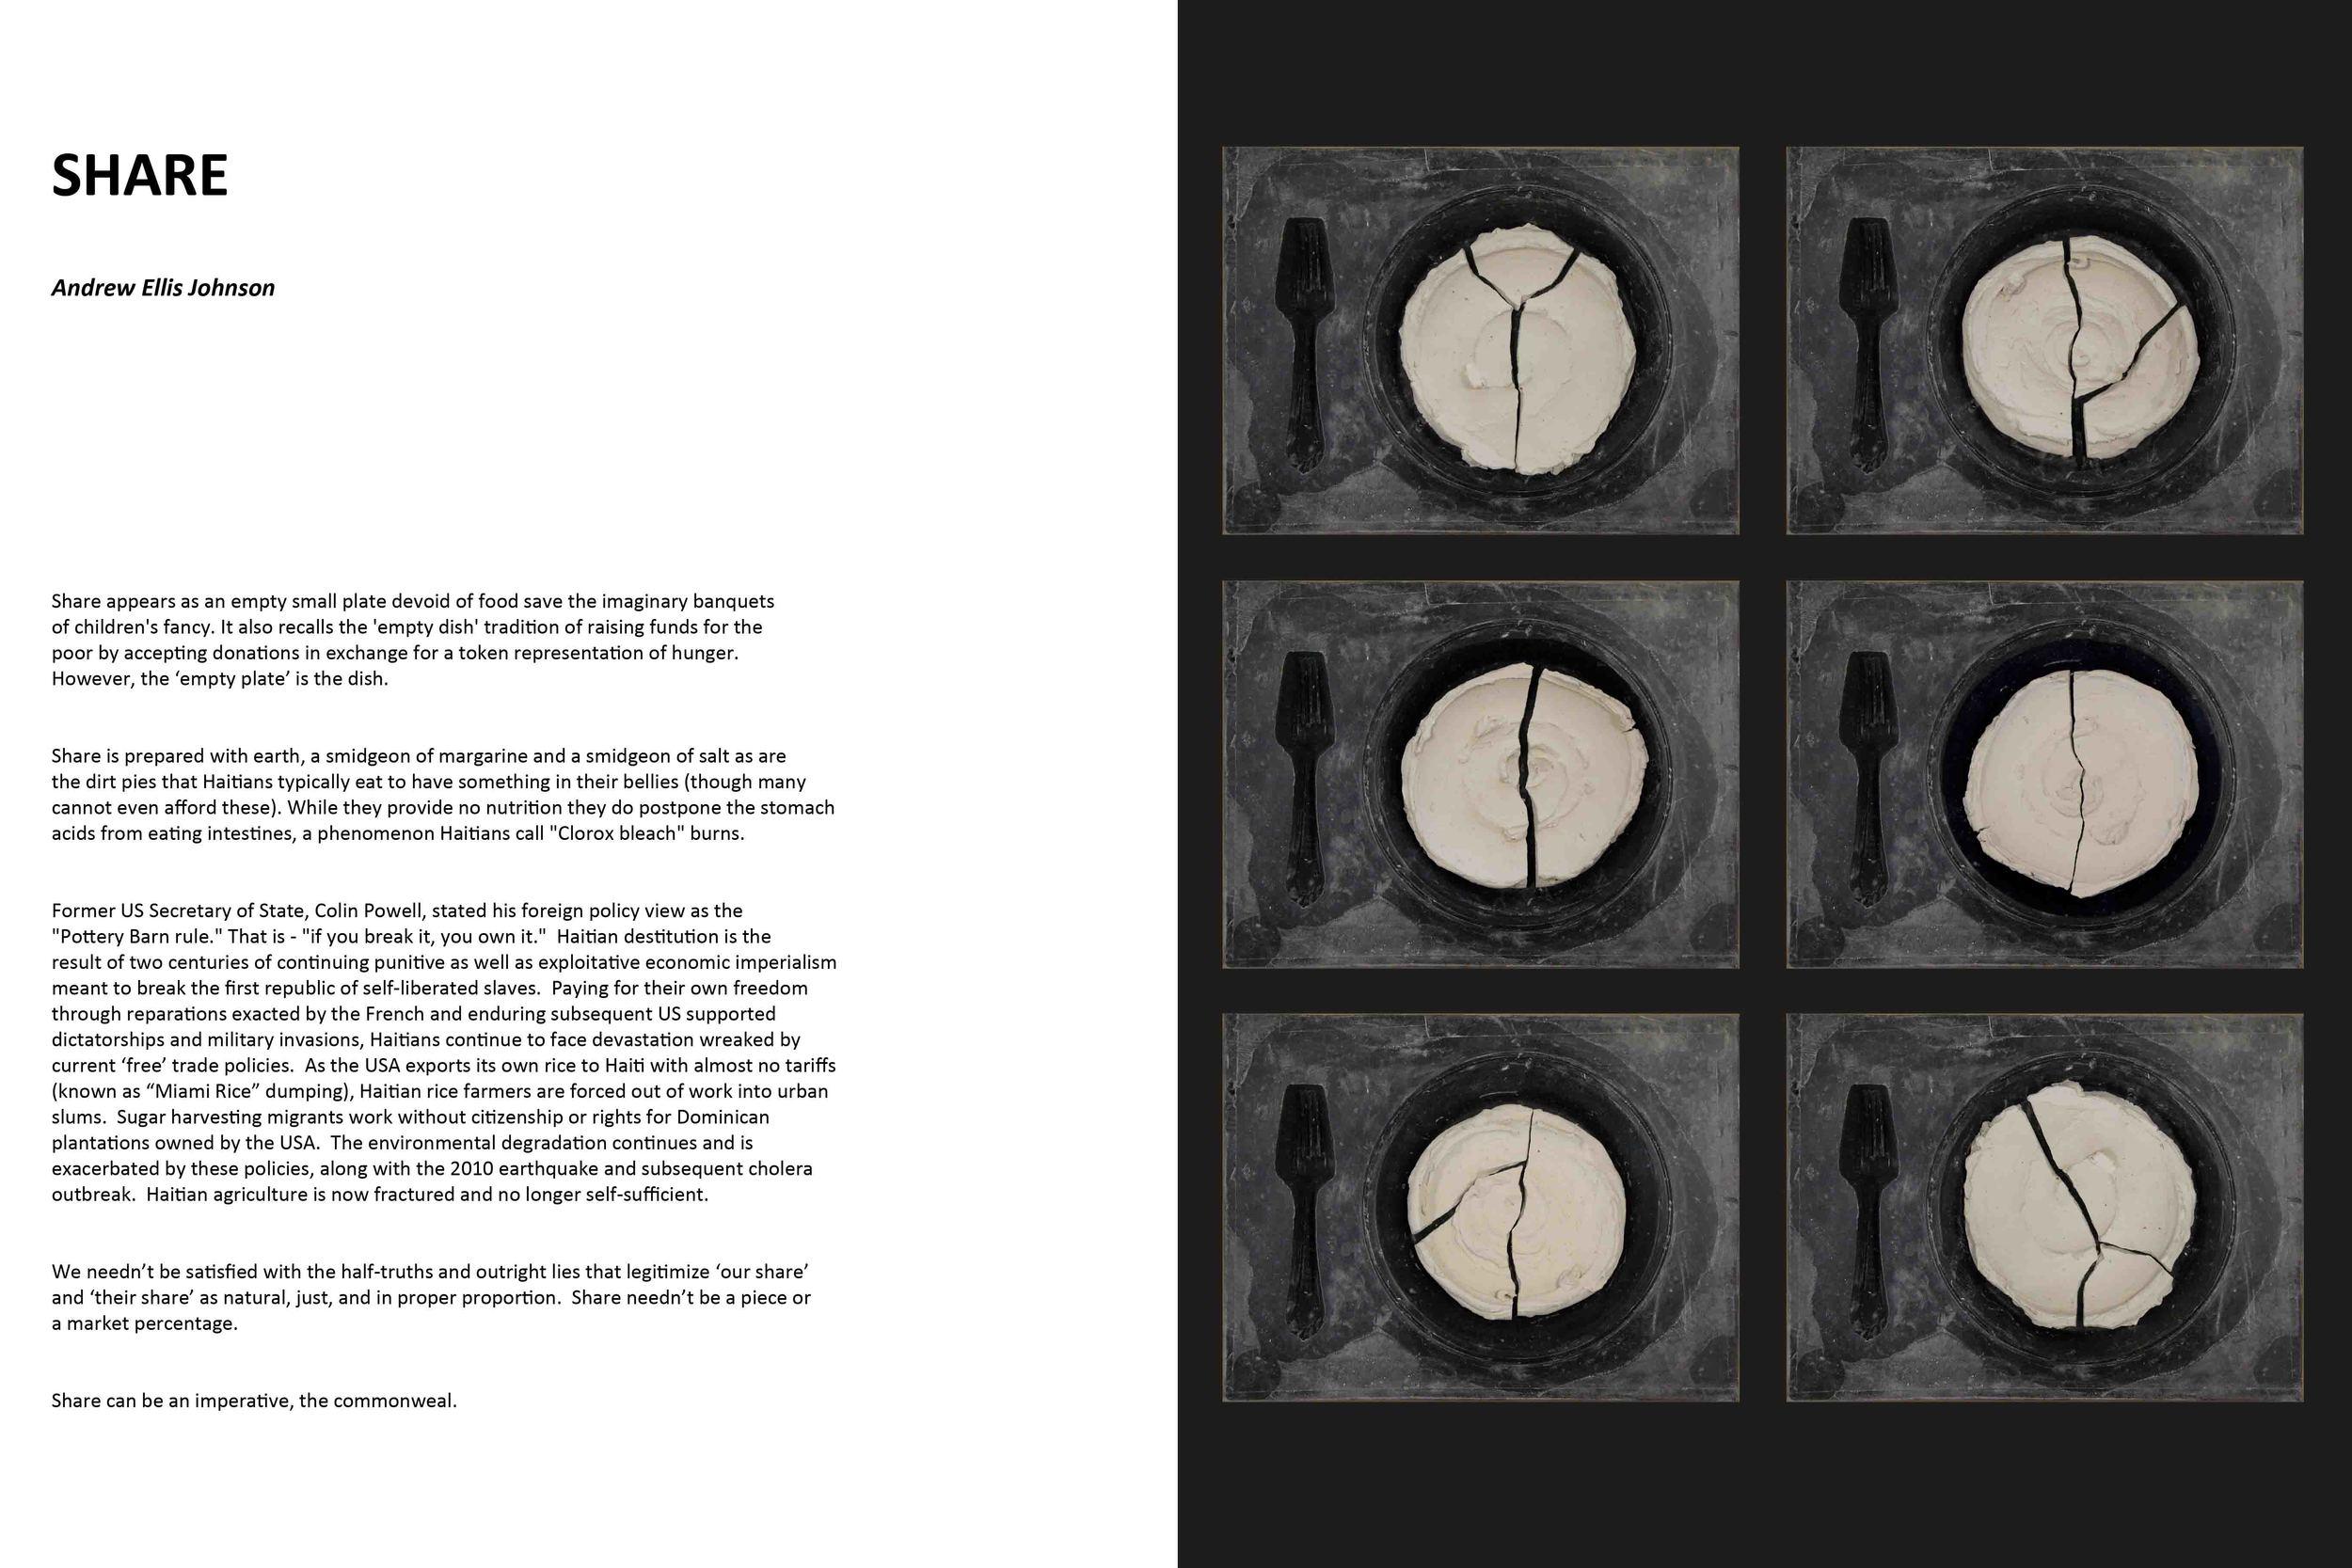 Publication version of SHARE, 2010, Haitian mud, smidgeon of margarine, smidgeon of salt, elite granite, absent fork, page 1